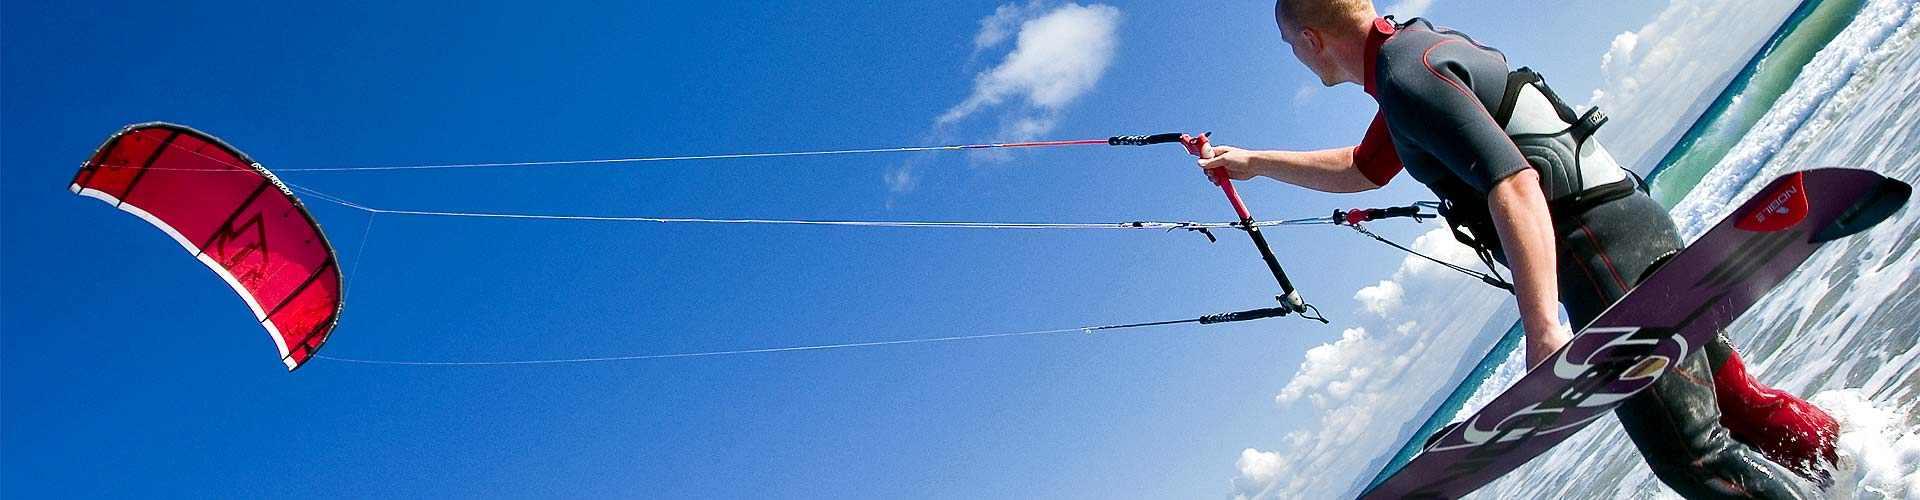 kitesurf en centrosdeportes de Paraños